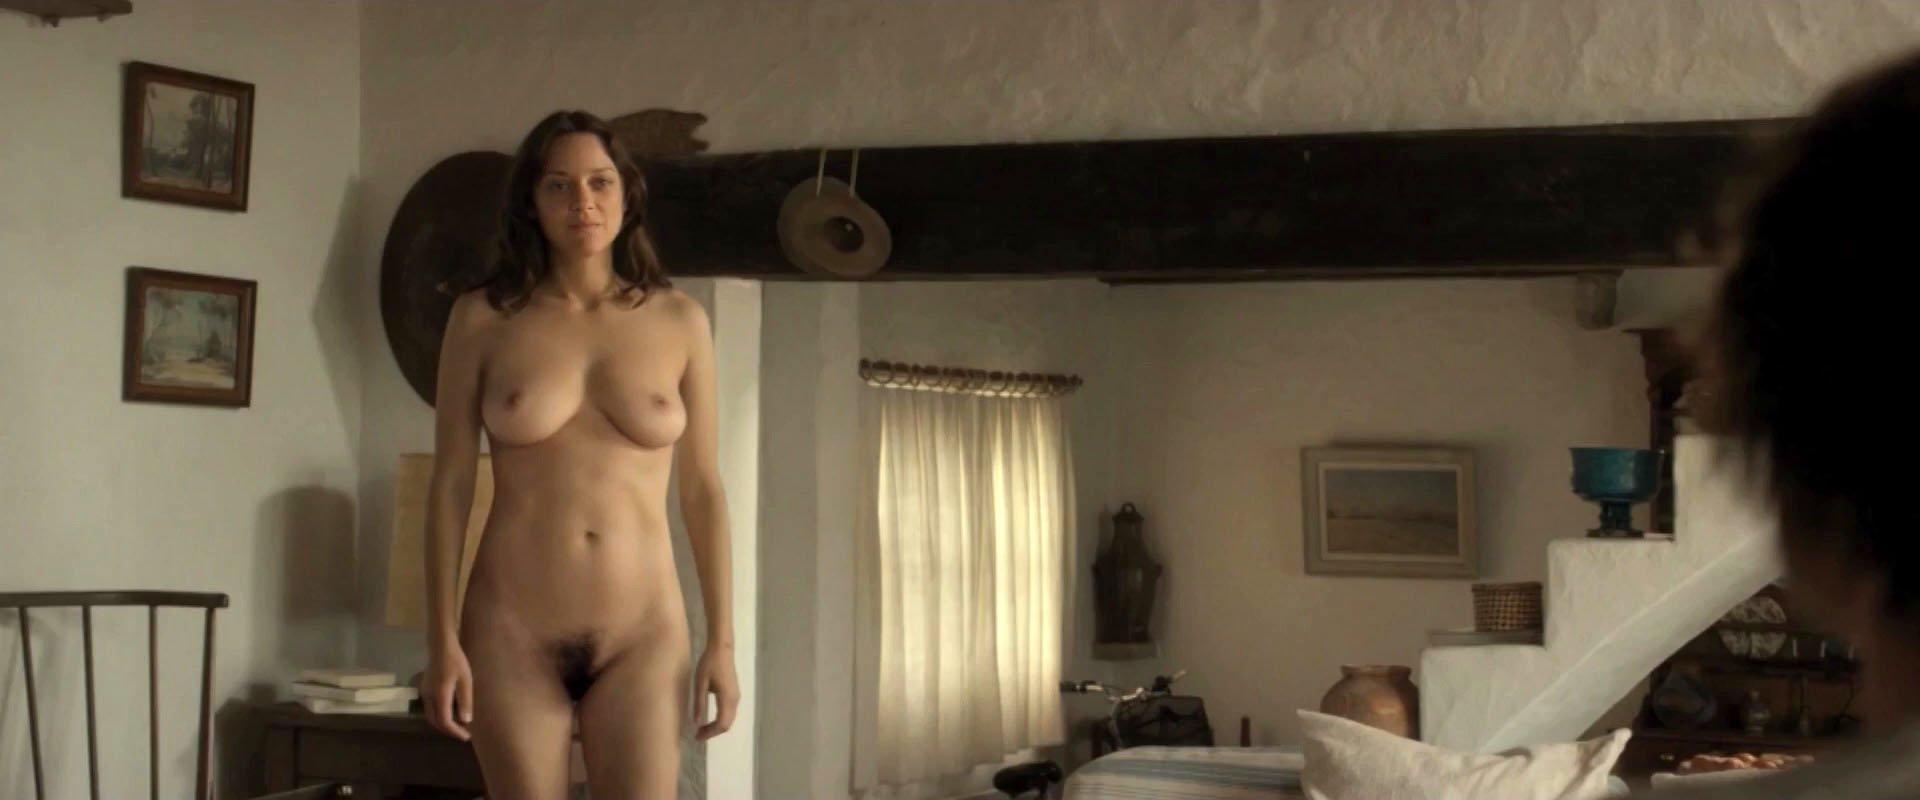 Marion Cotillard - Les fantomes d'Ismael (2017)